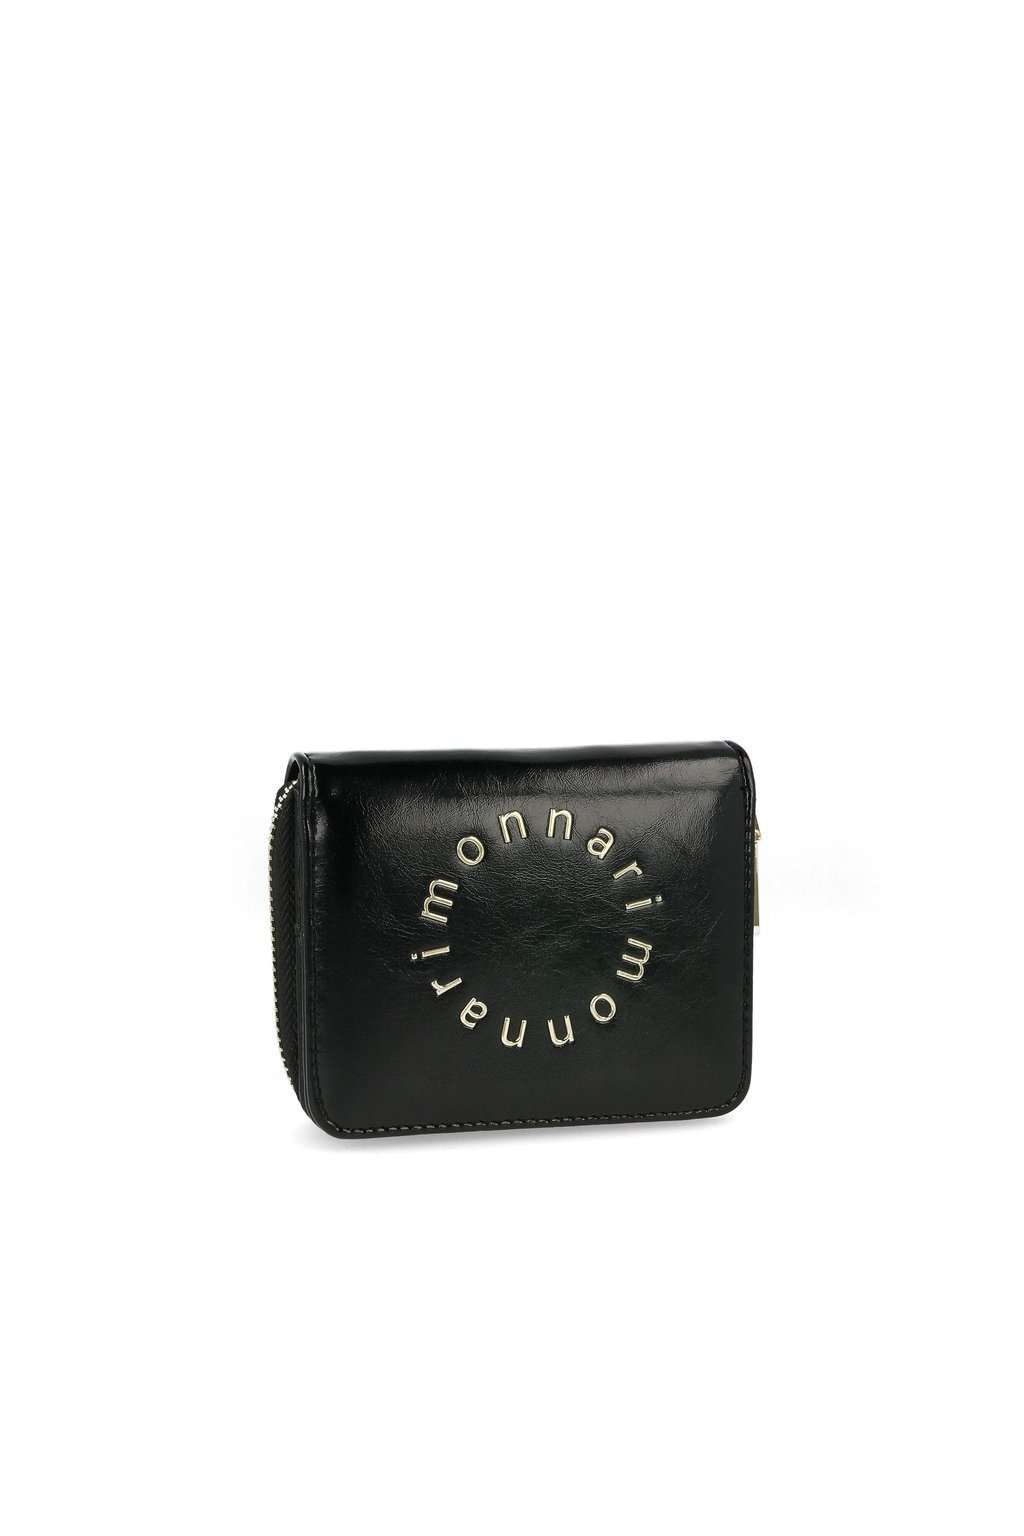 Peňaženka farba čierna kód PUR0040-020